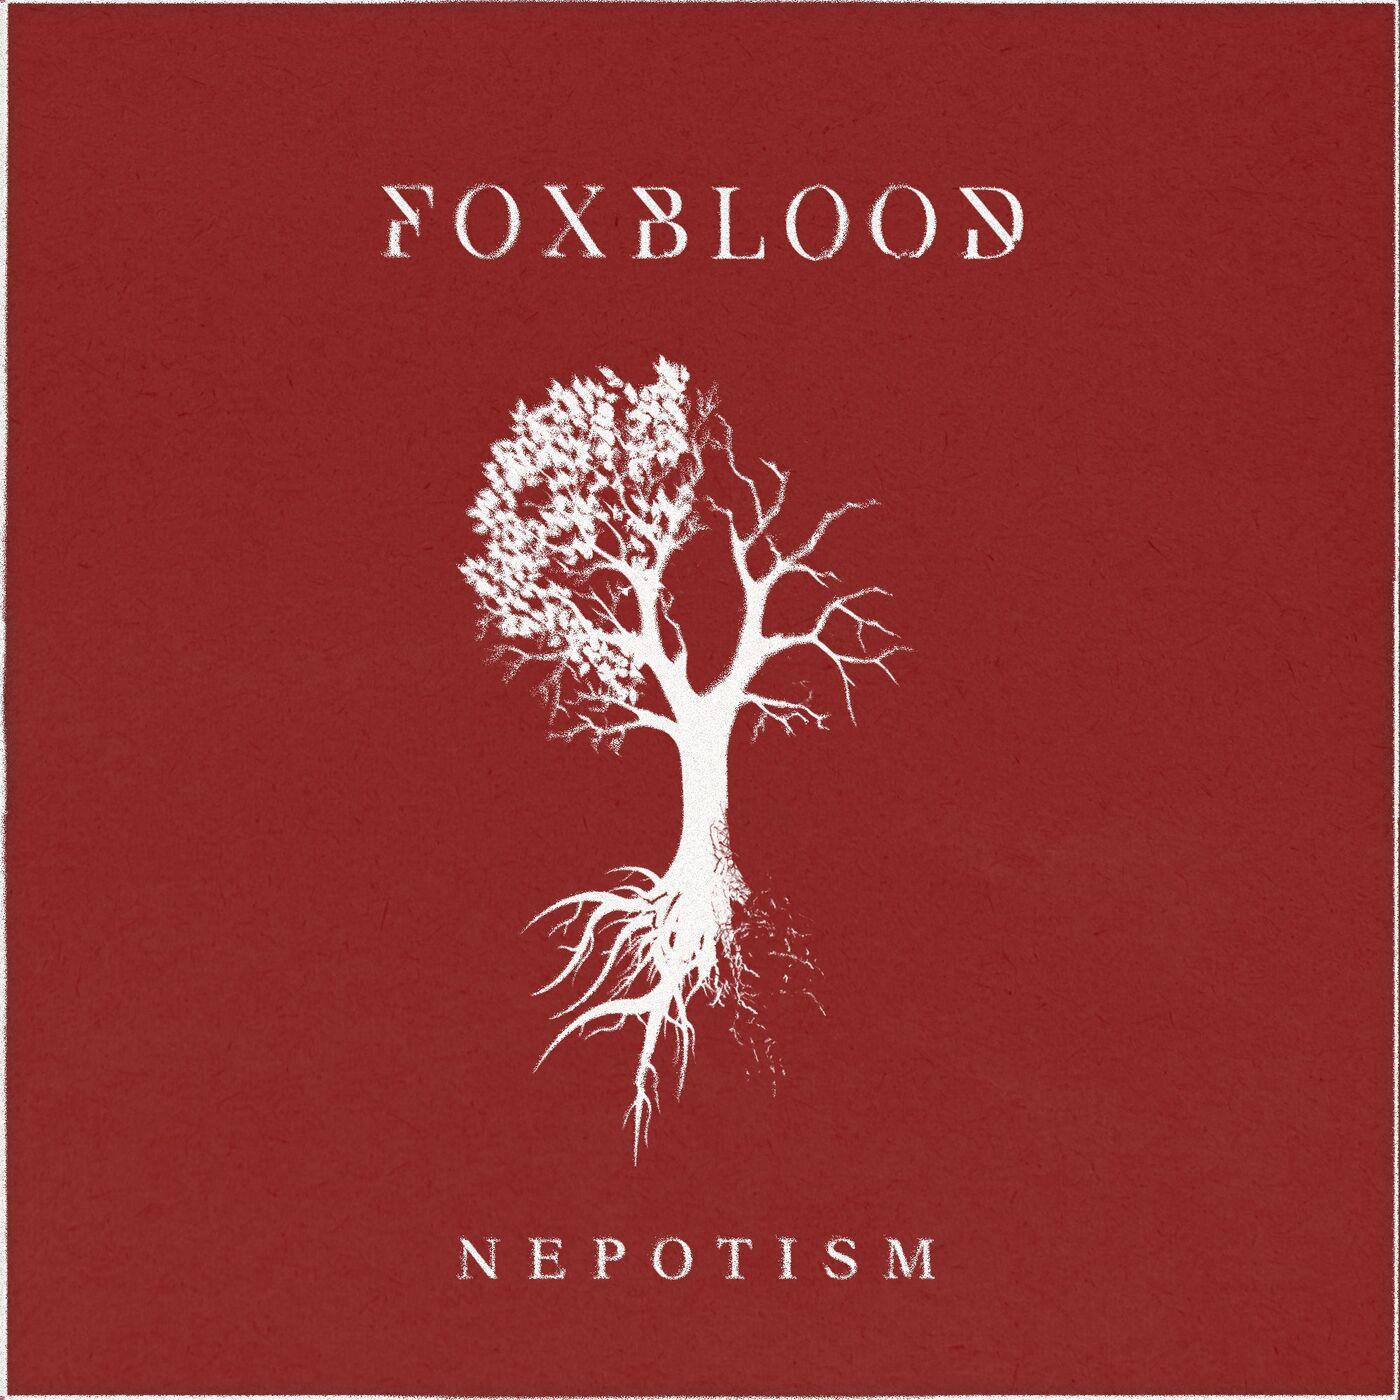 Foxblood - Nepotism [single] (2020)